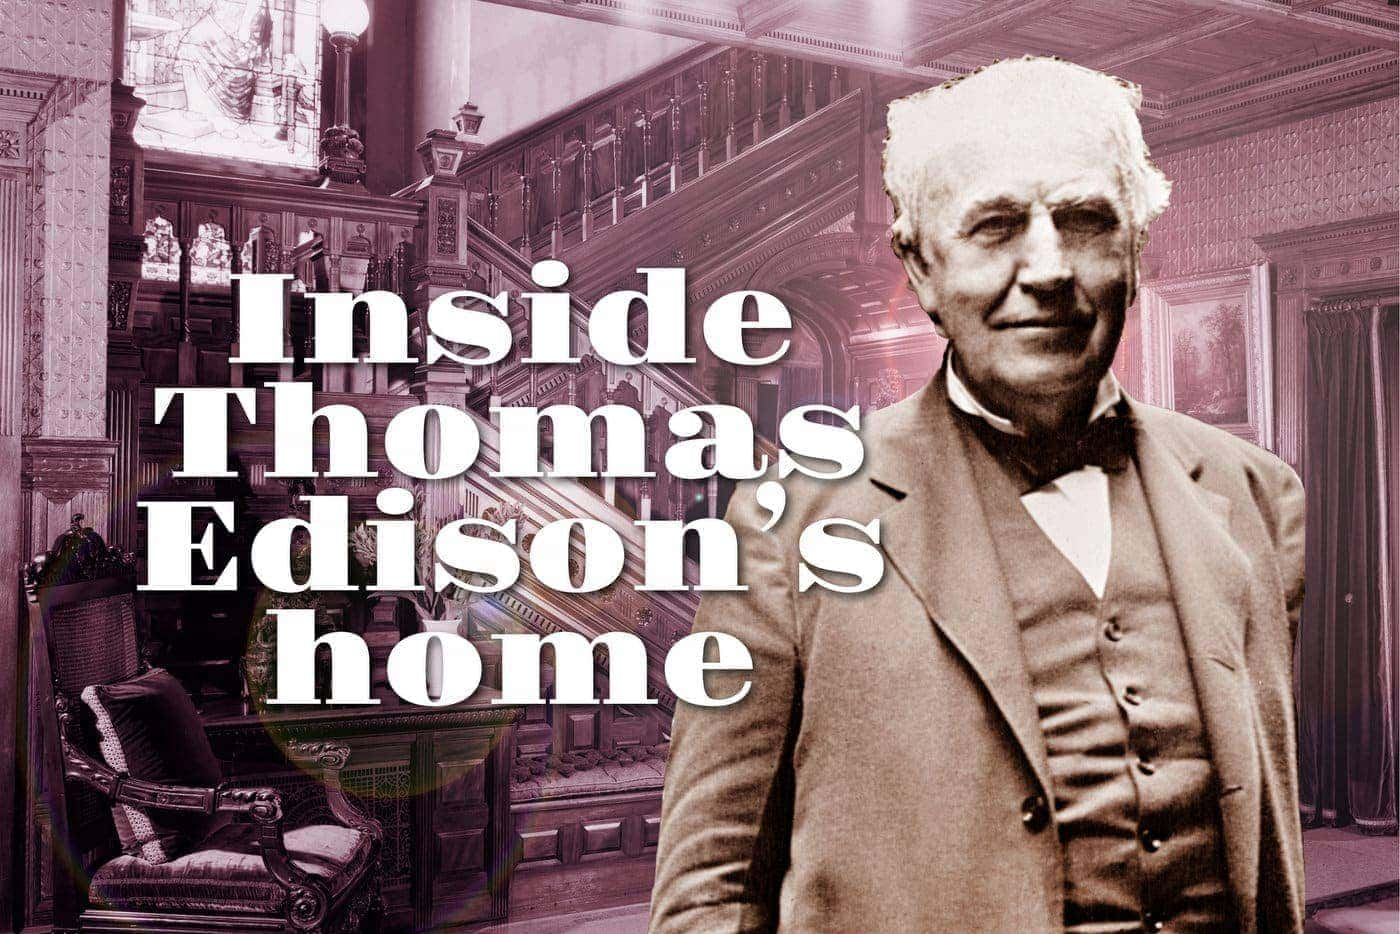 Inside Thomas Edison's home